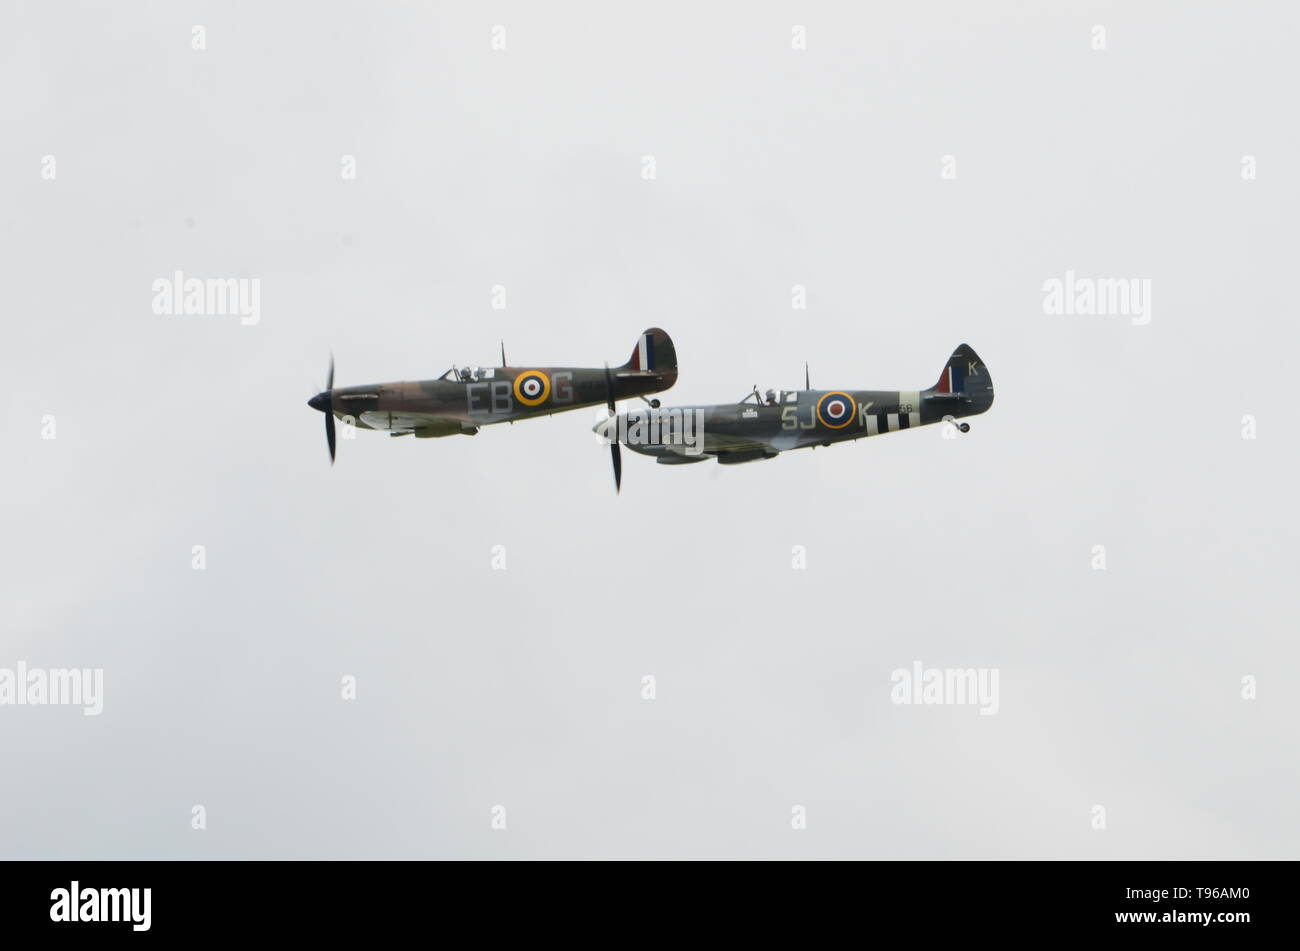 Supermarine Spitfire, Battle of Britain - Stock Image